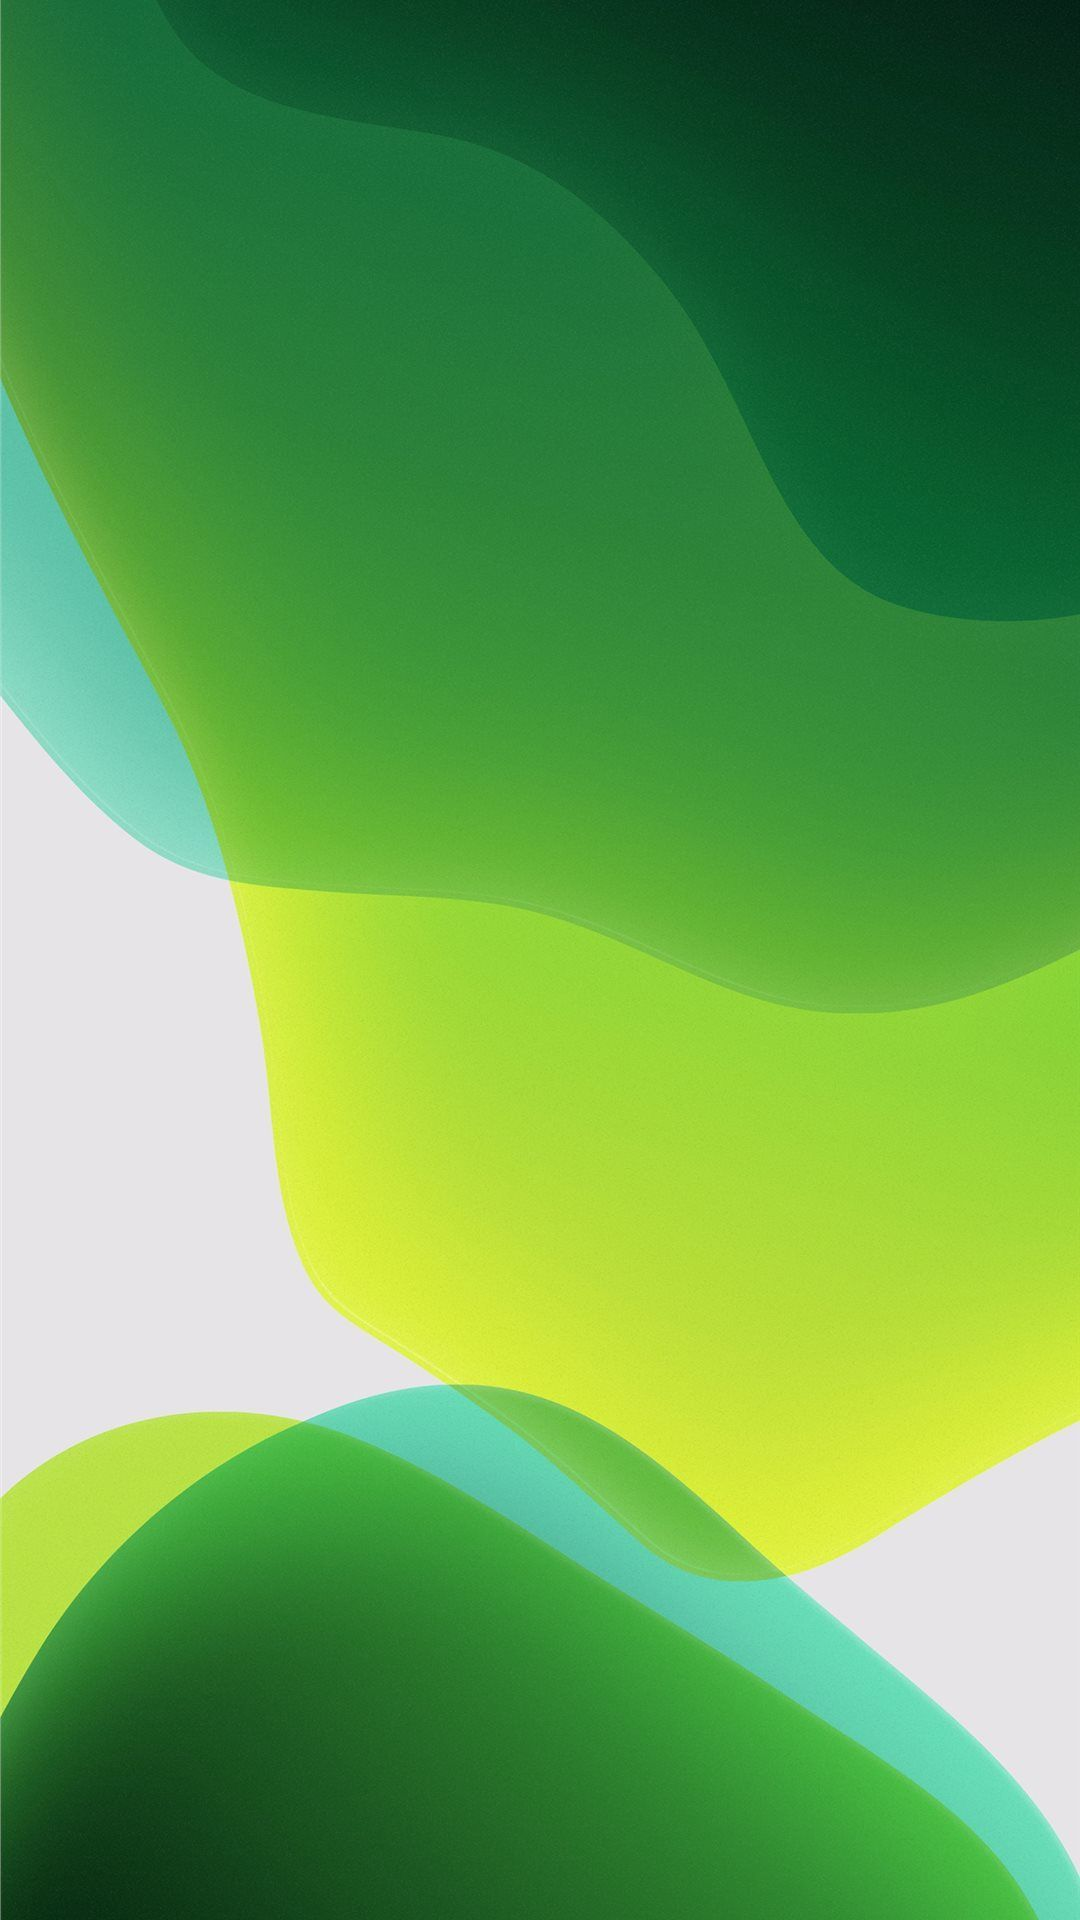 Ios 13 Wallpaper Ios13wallpaper Abstract Iphone Wallpaper